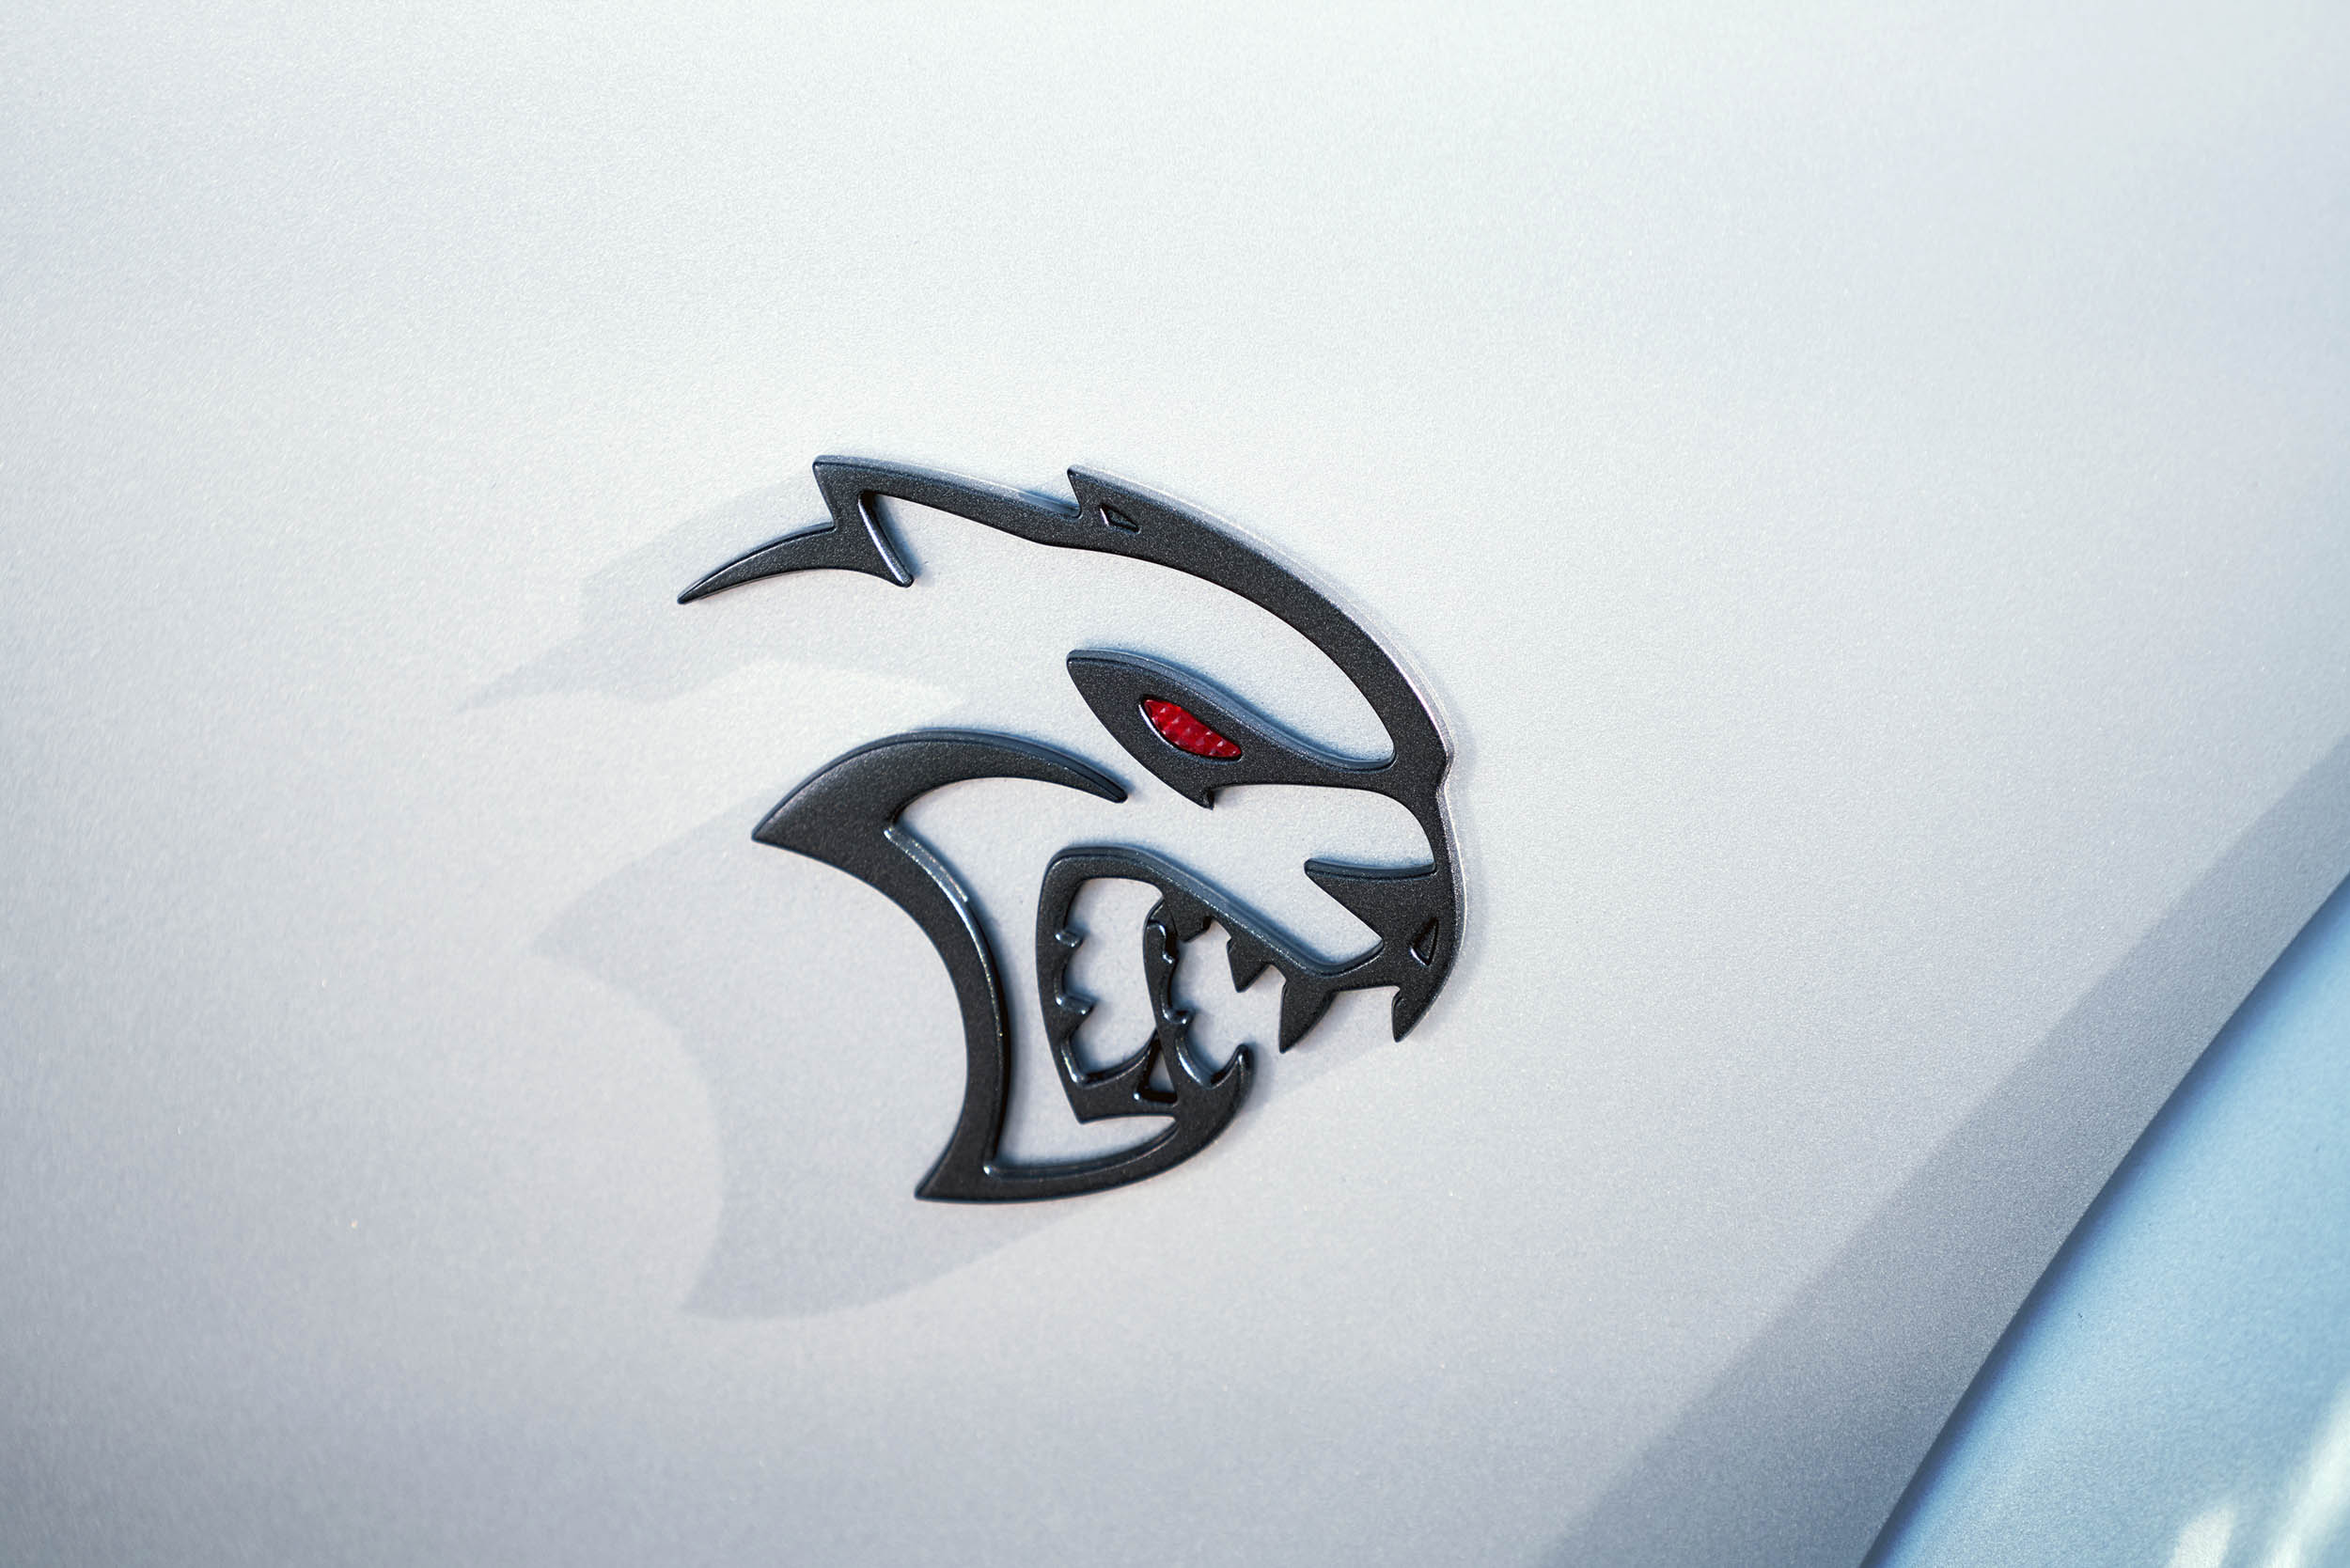 2019 Dodge Challenger SRT Hellcat Redeye Widebody - fender badge